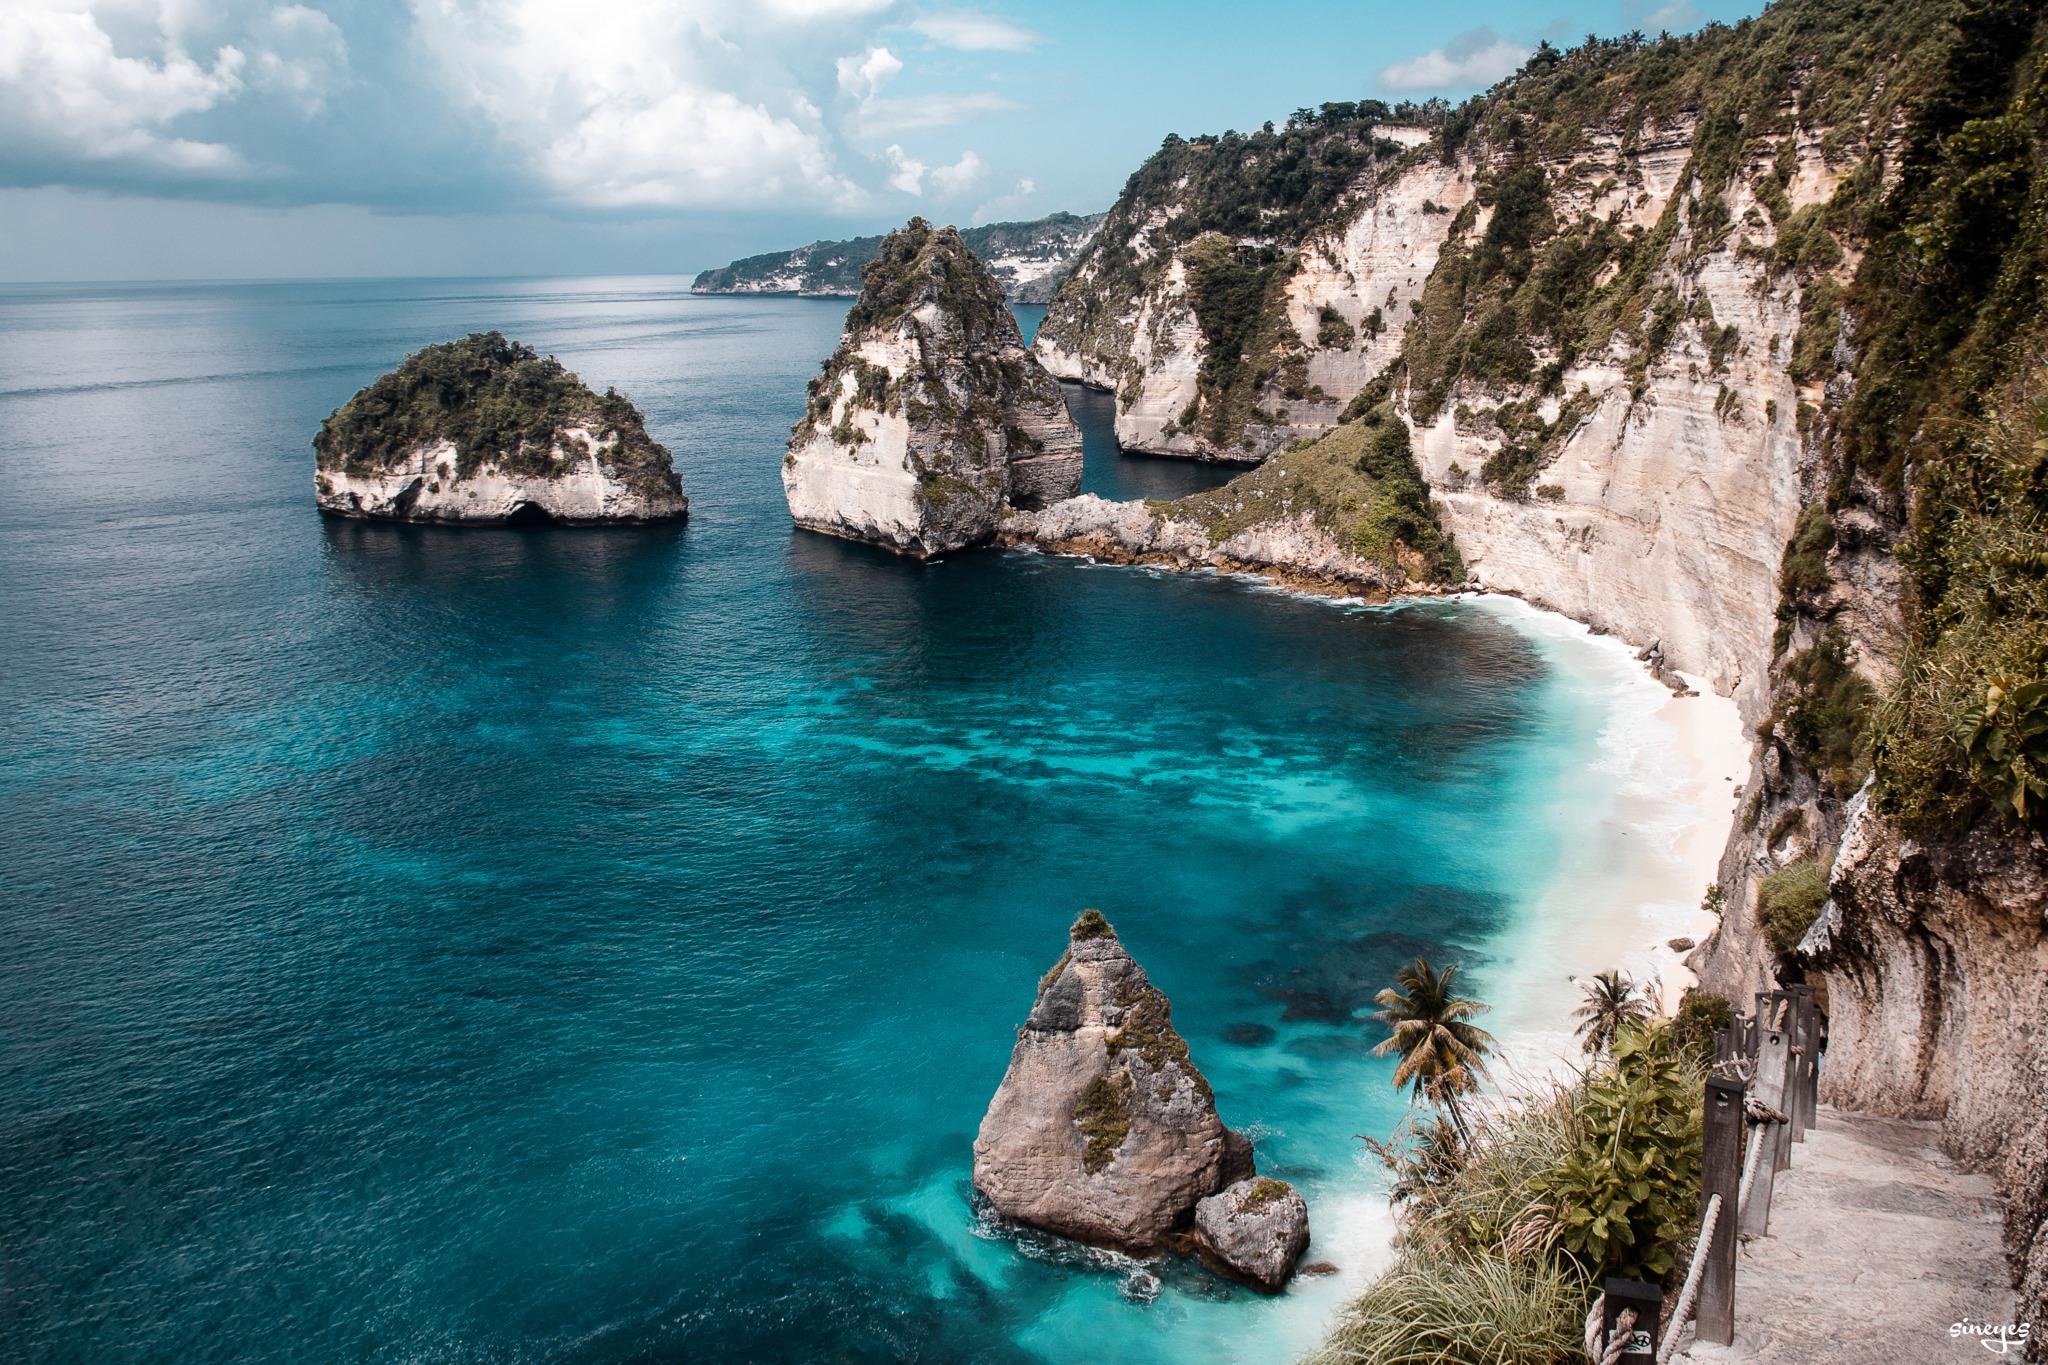 Diamond beach by sineyes